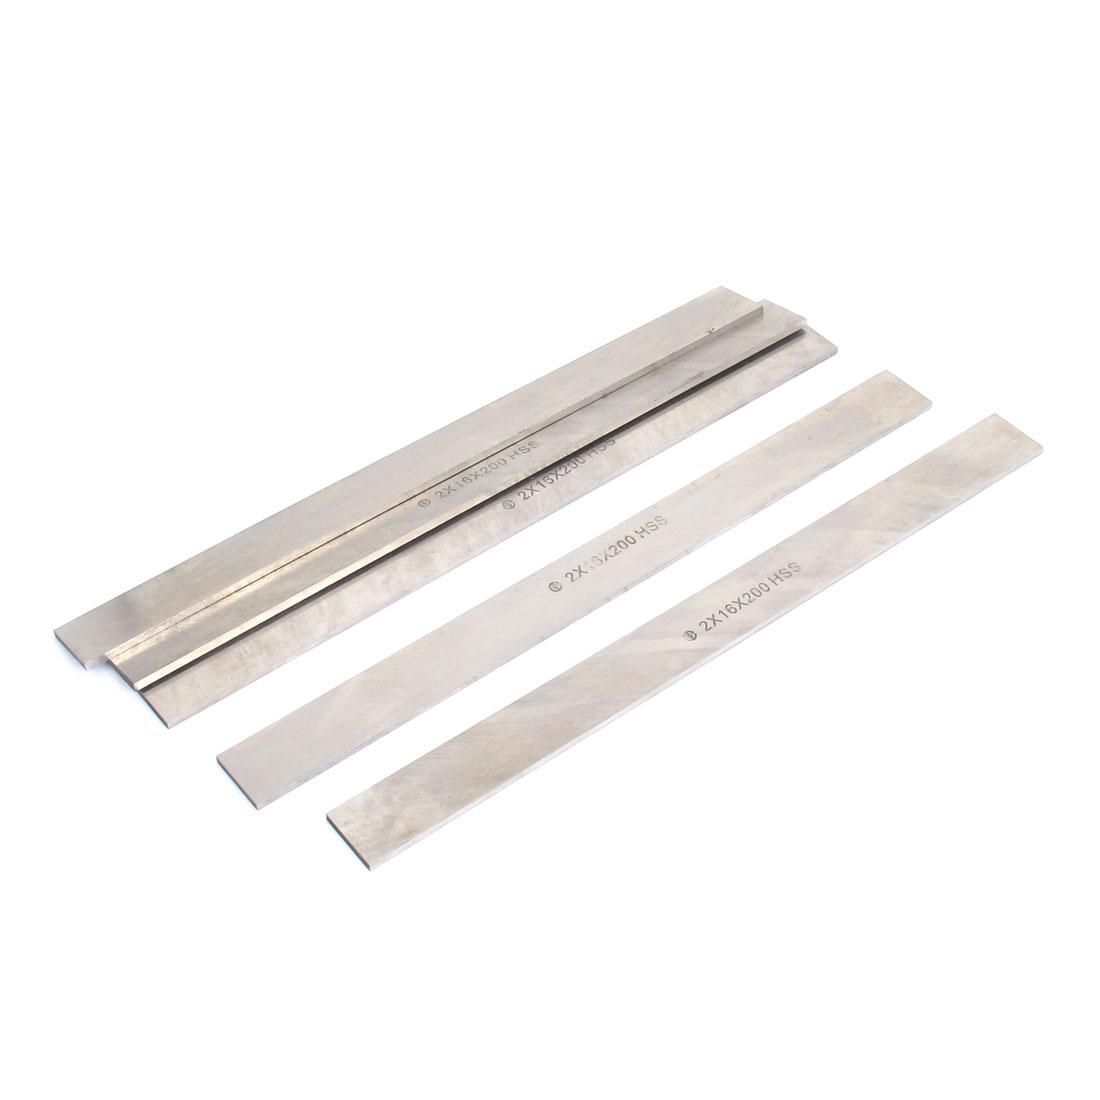 Rectangle Shape Lathe HSS Tool Bit Silver Tone 2mm x 16mm x 200mm 5pcs